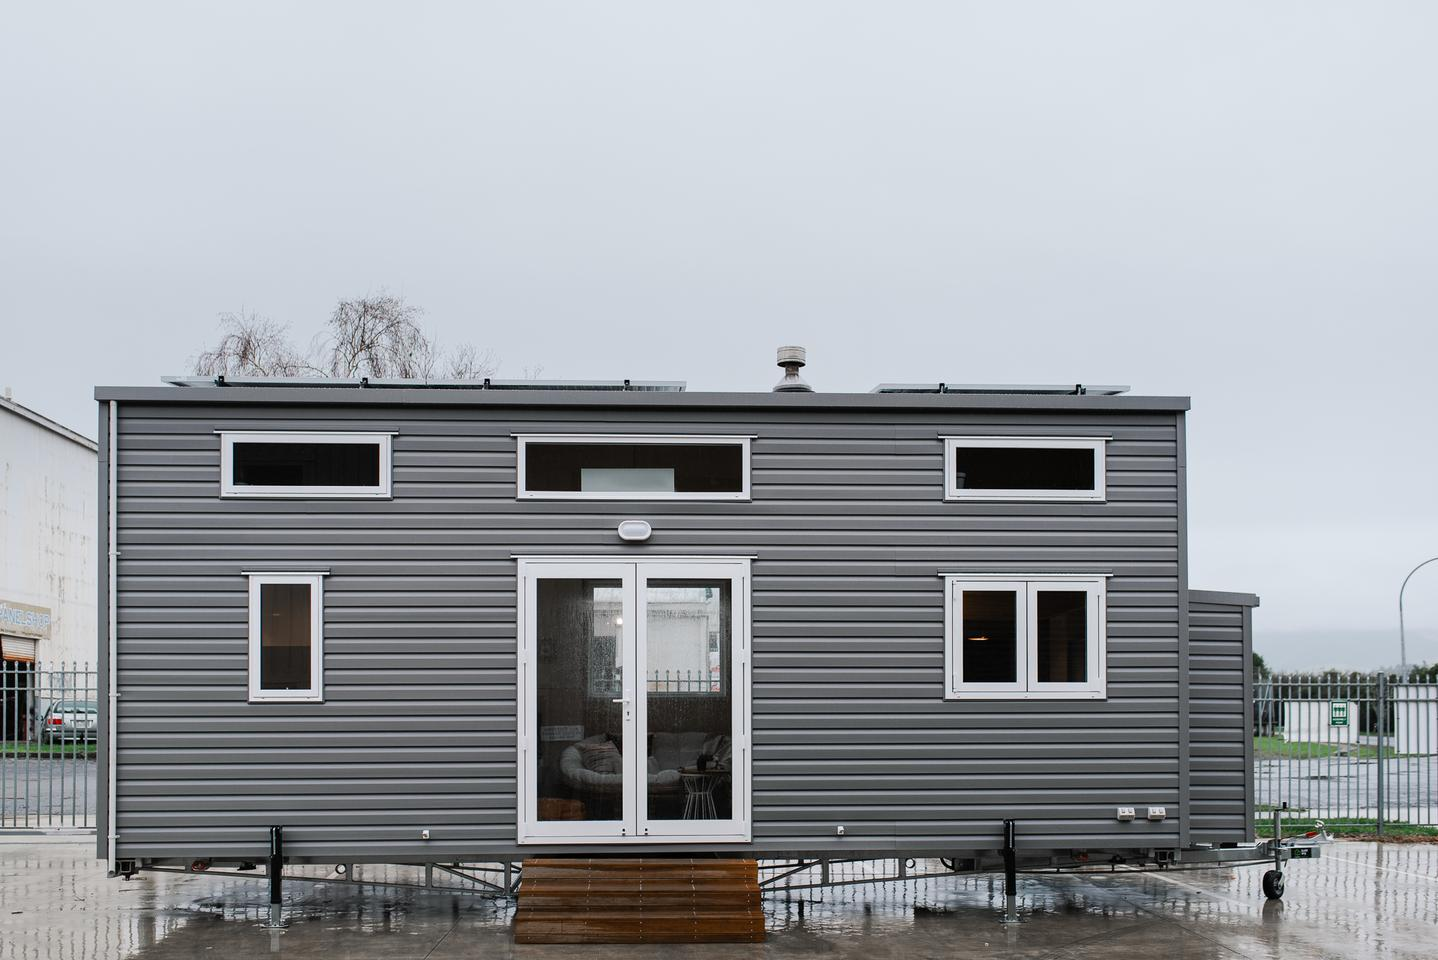 The Kahurangi Koinga Tiny House is based on a double-axle trailer